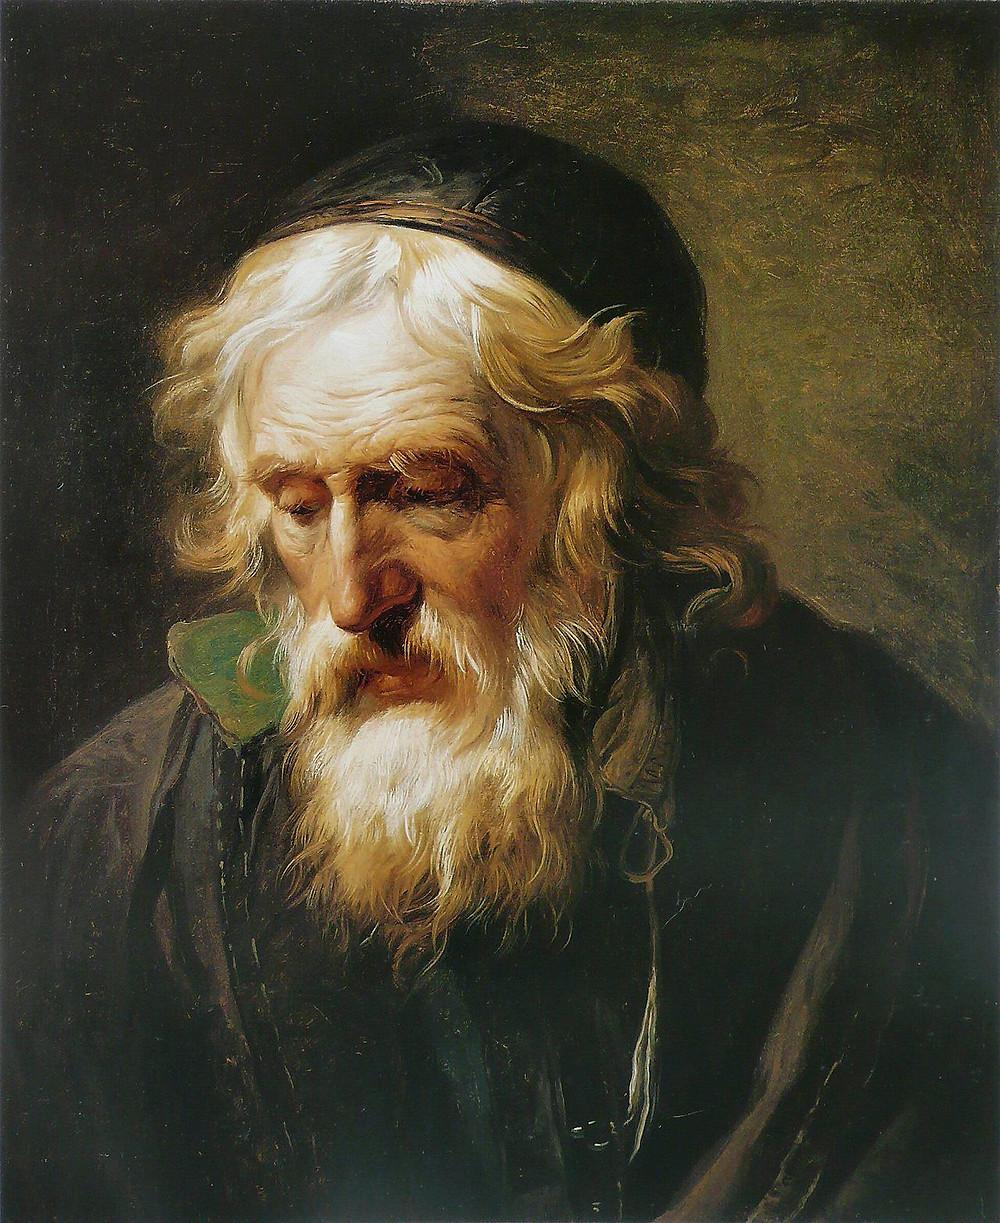 Oil painting priesta cura griego greek monje singular